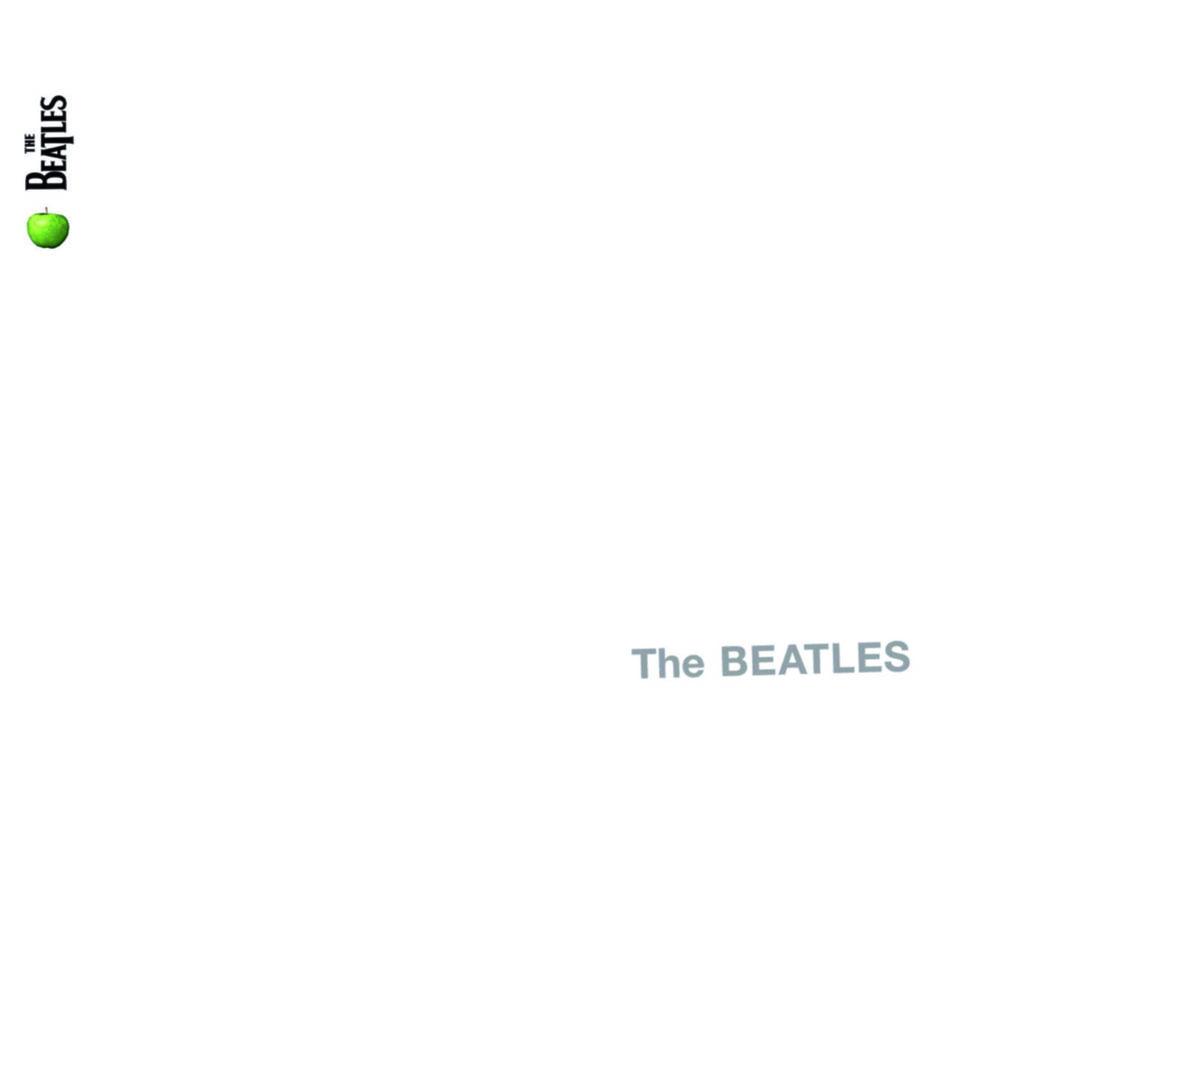 Beatles_The Beatles